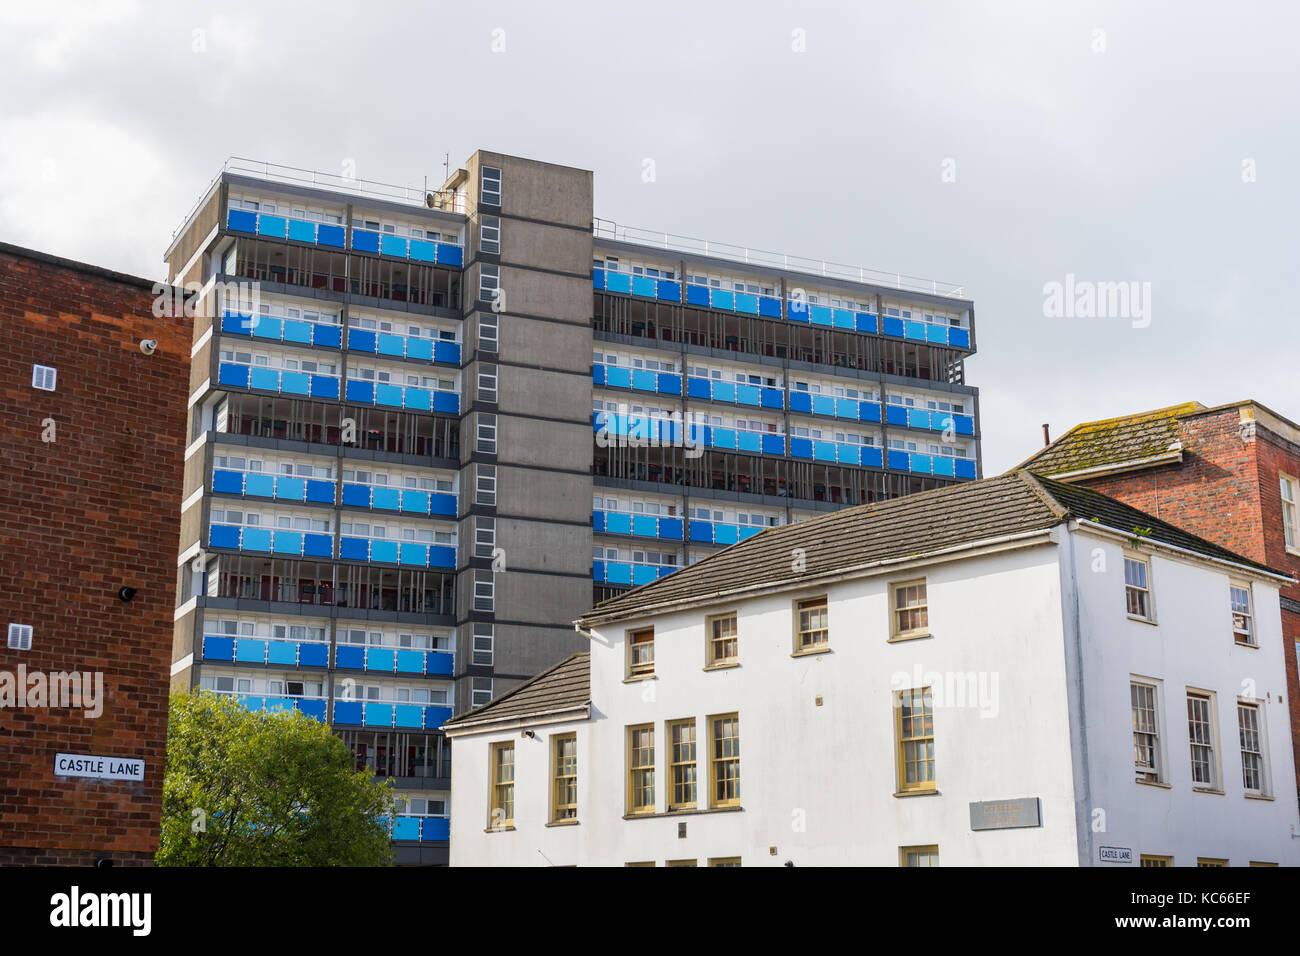 Contrasting architecture along Castle Lane, Southampton, England, UK - Stock Image